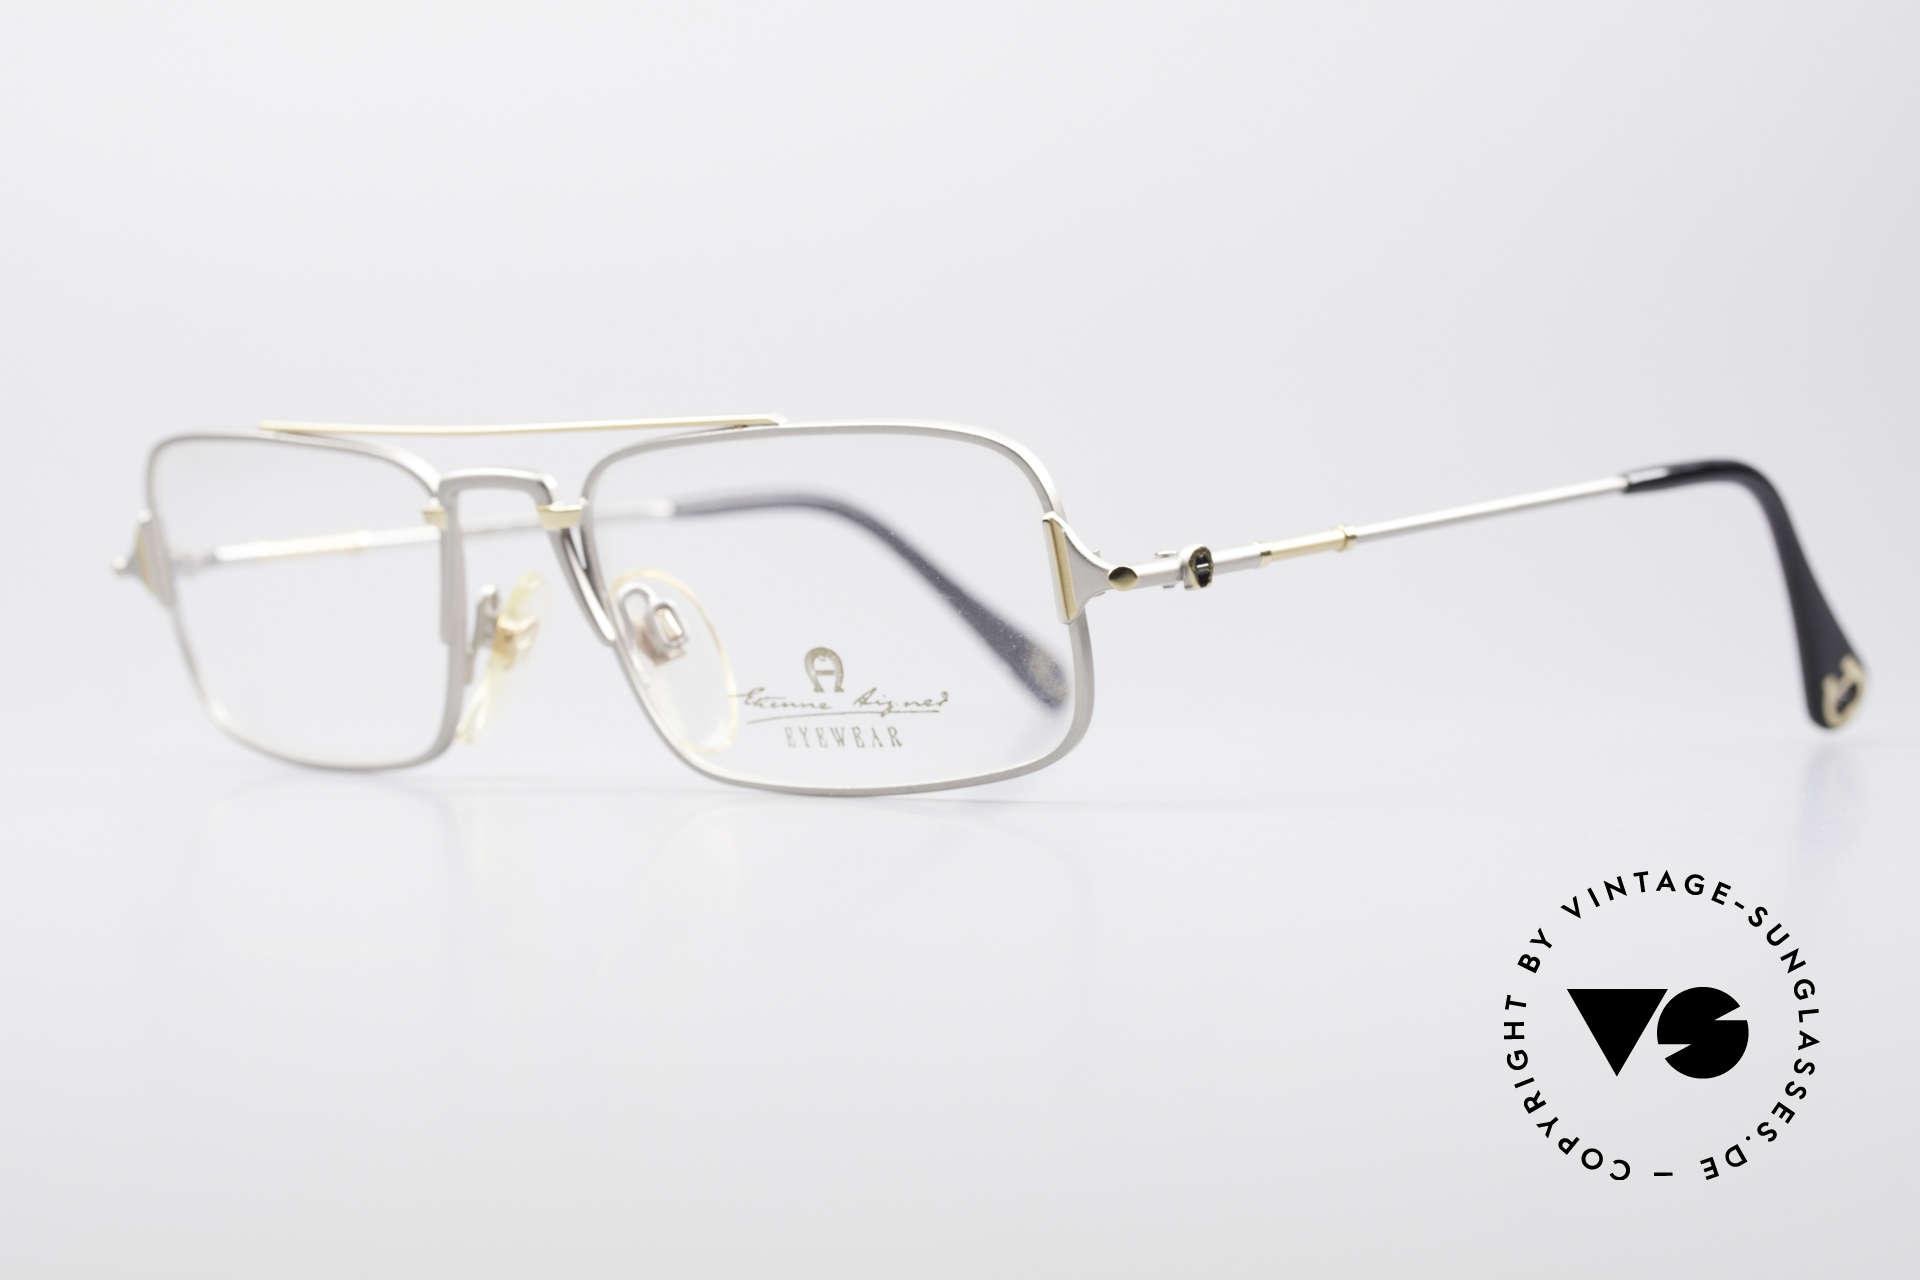 Aigner EA44 Rare 80's Vintage Eyeglasses, true luxury vintage eyewear - just precious & rare!, Made for Men